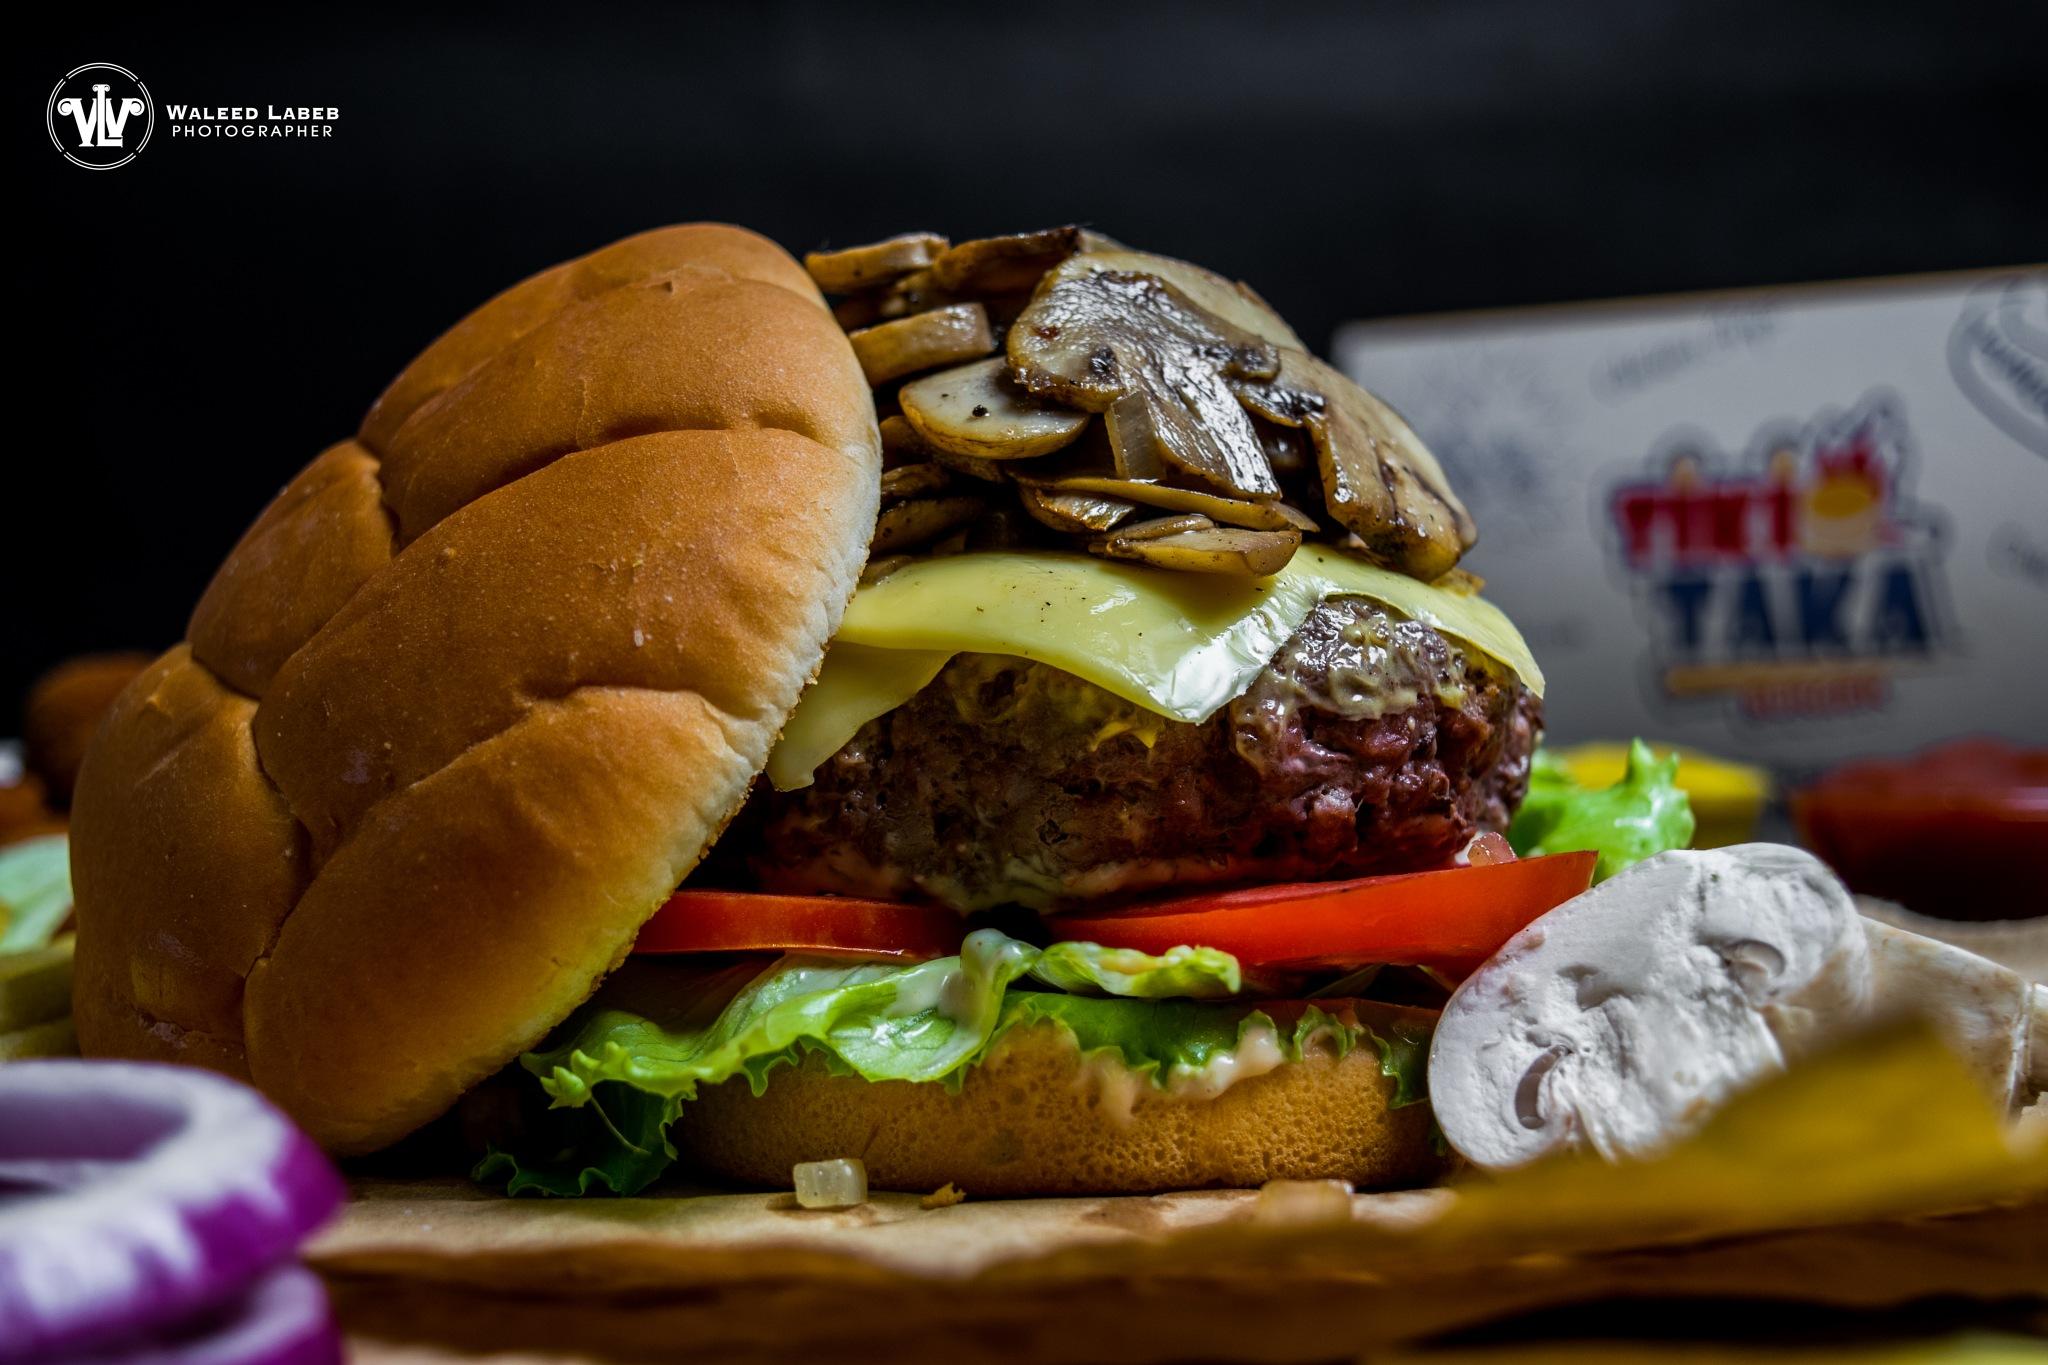 burger by waleed labeb